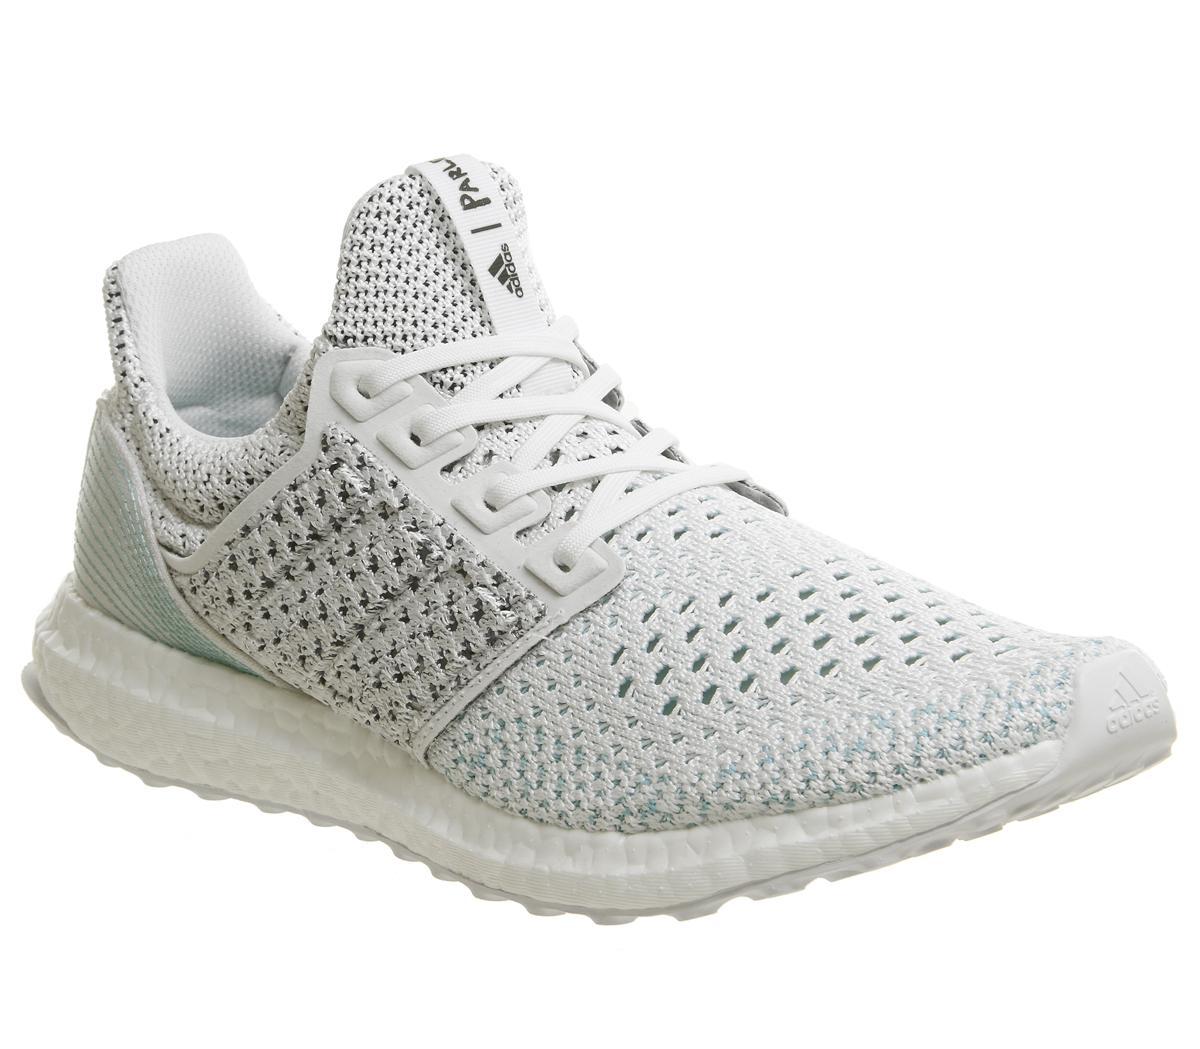 adidas Ultra Boost 4.0 Light Grey Blue Jordan Depot